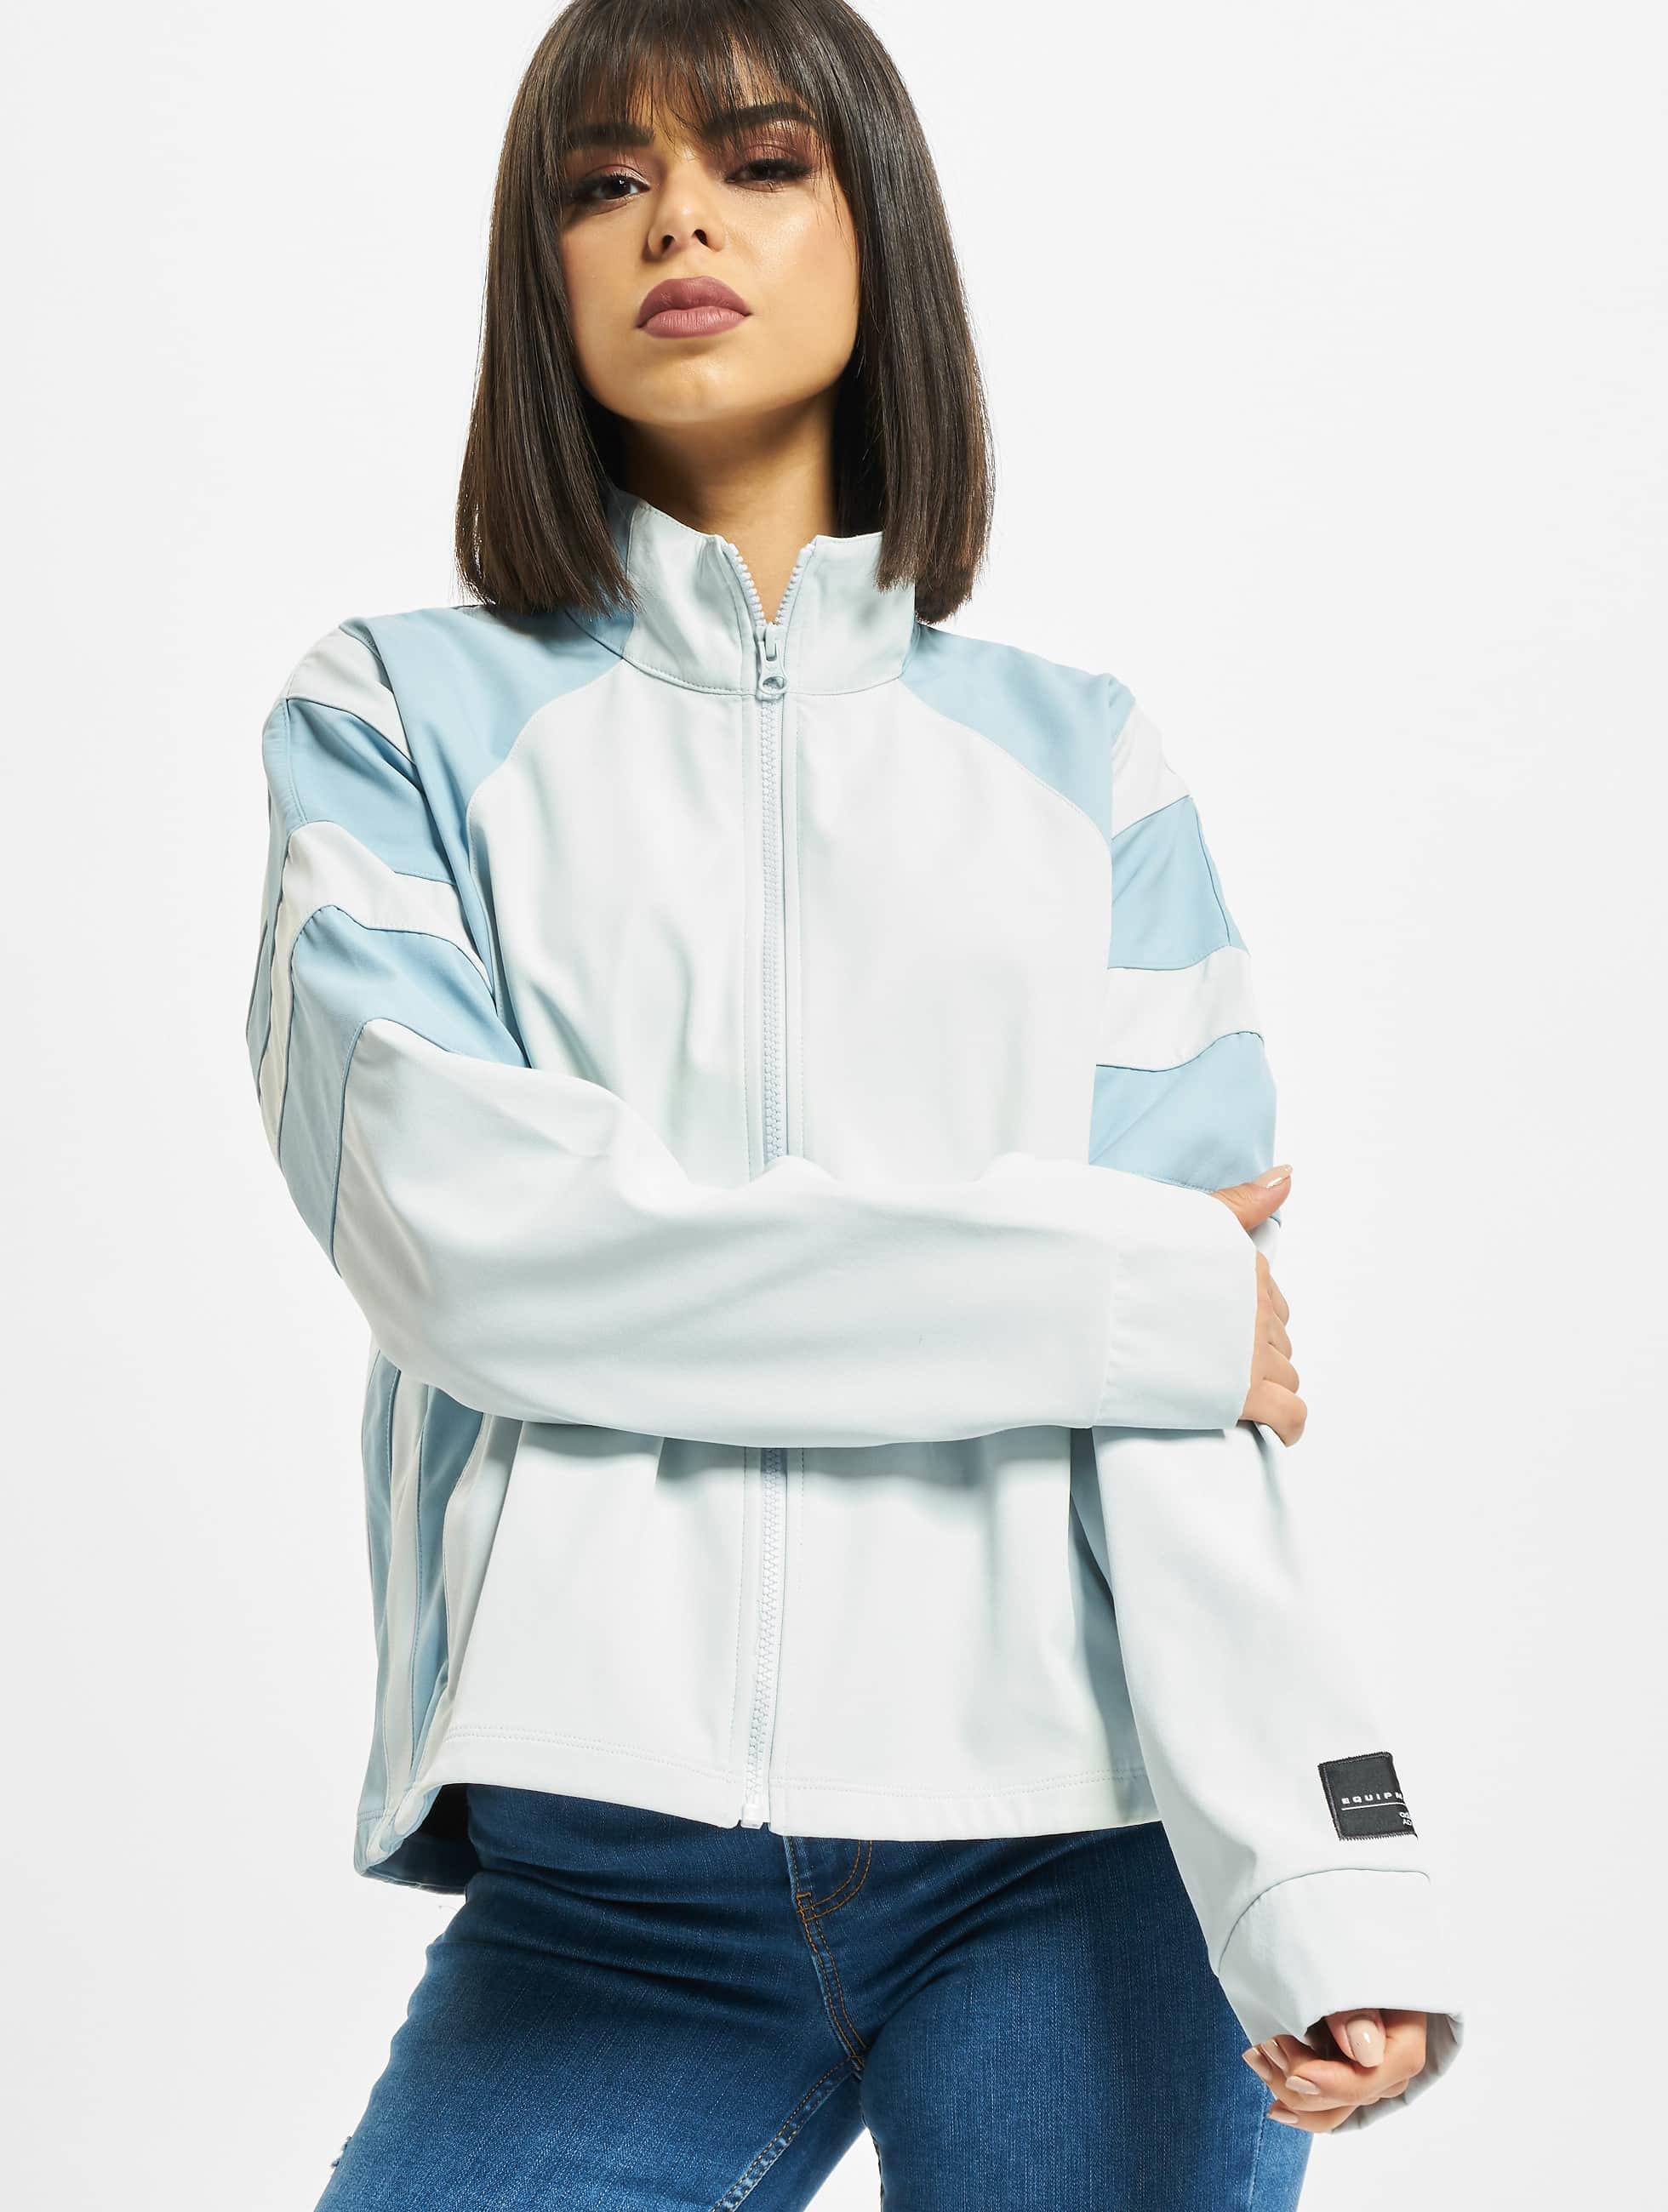 Adidas Equipment Track Top Jacket Ash Grey